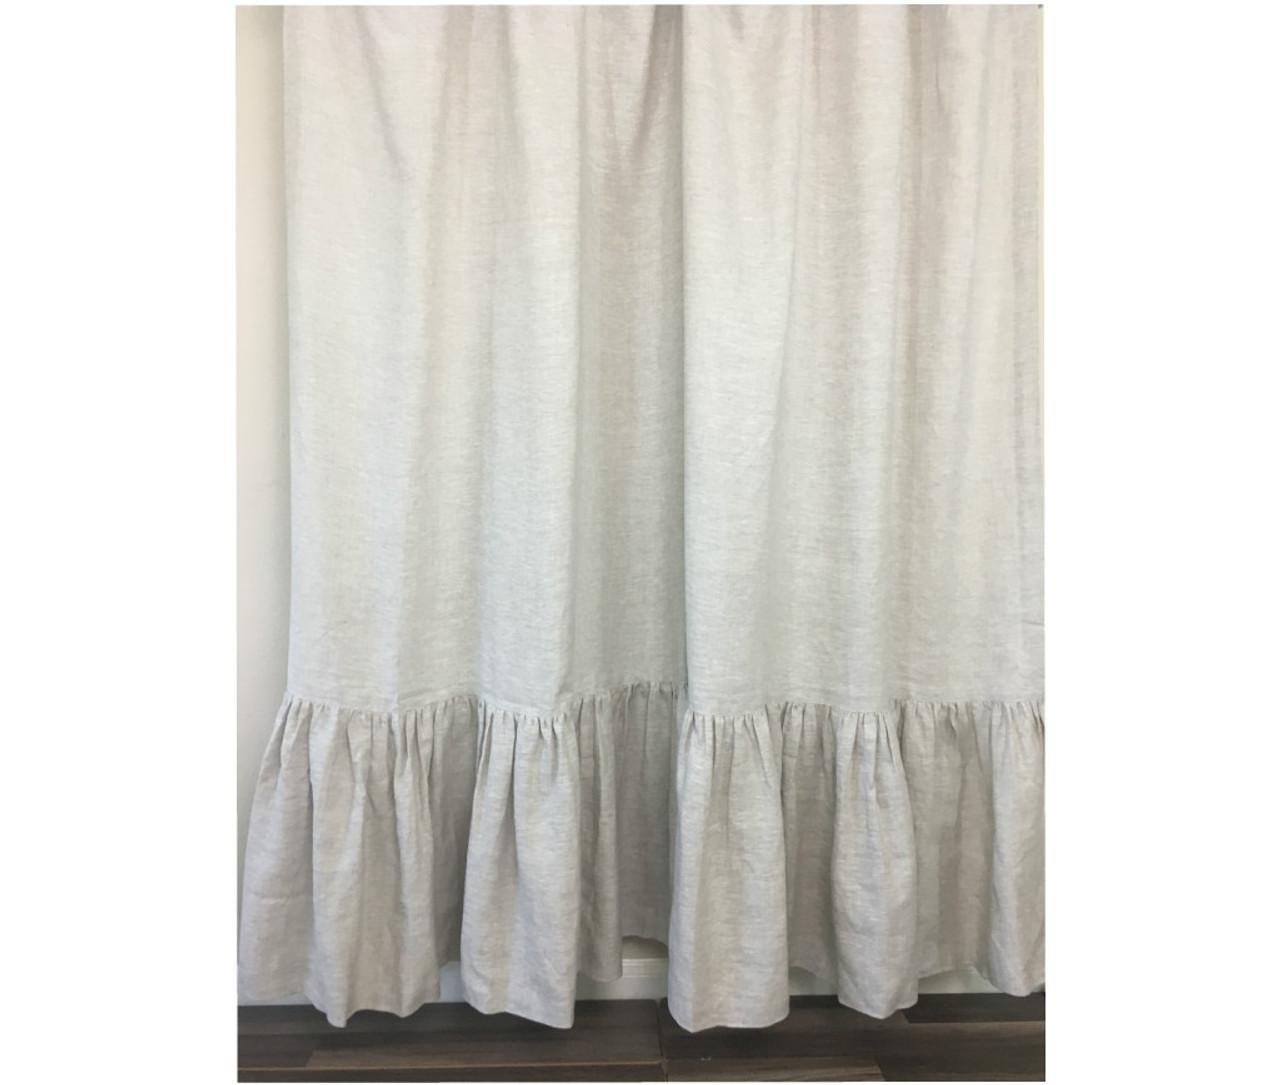 Natural Linen Shower Curtain With Mermaid Long Ruffles Medium Weight Fabric